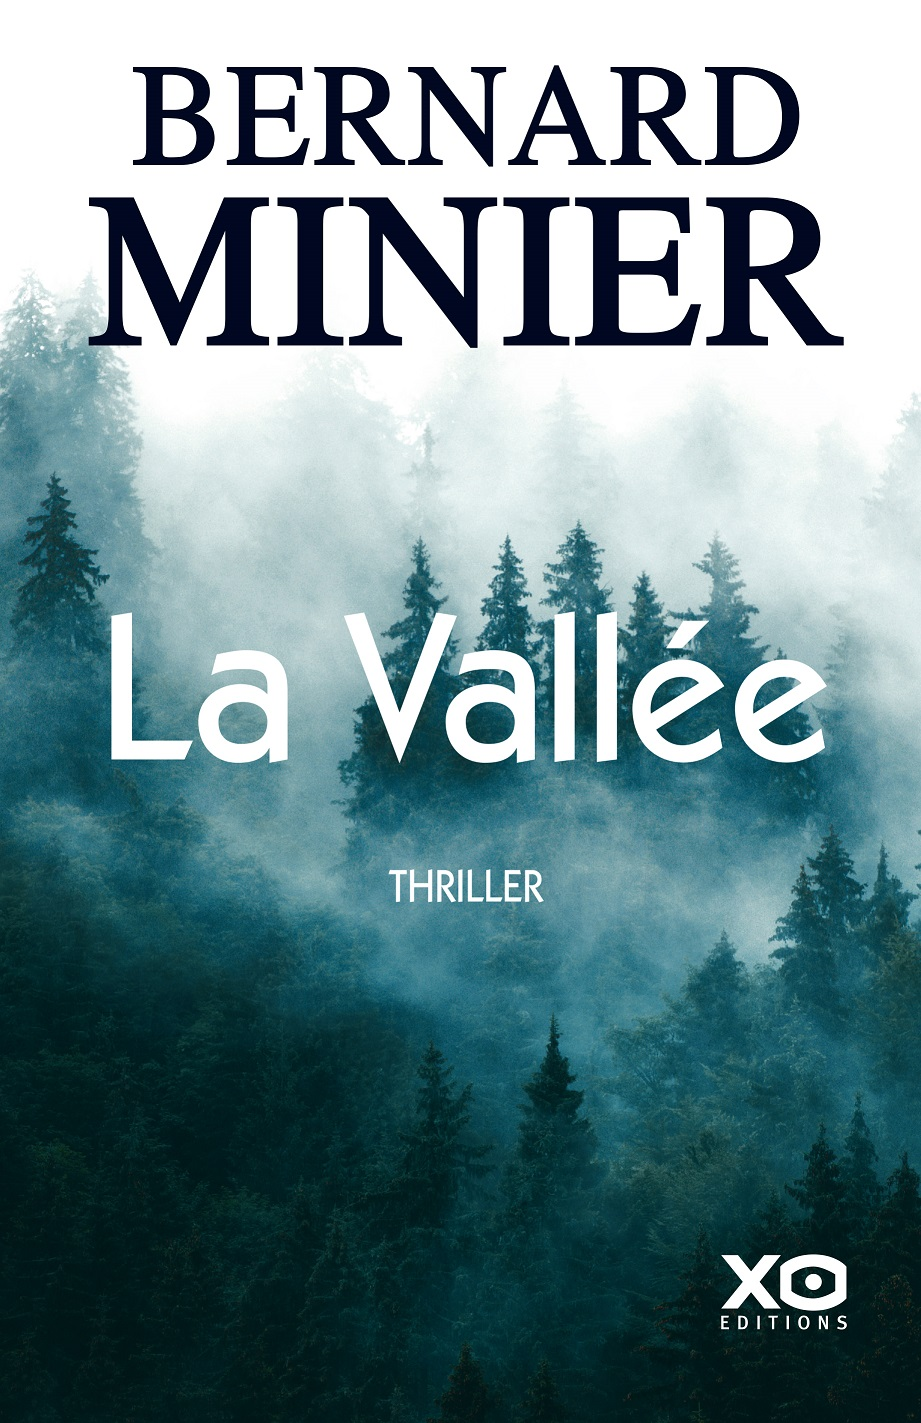 La Vallee Xo Editions